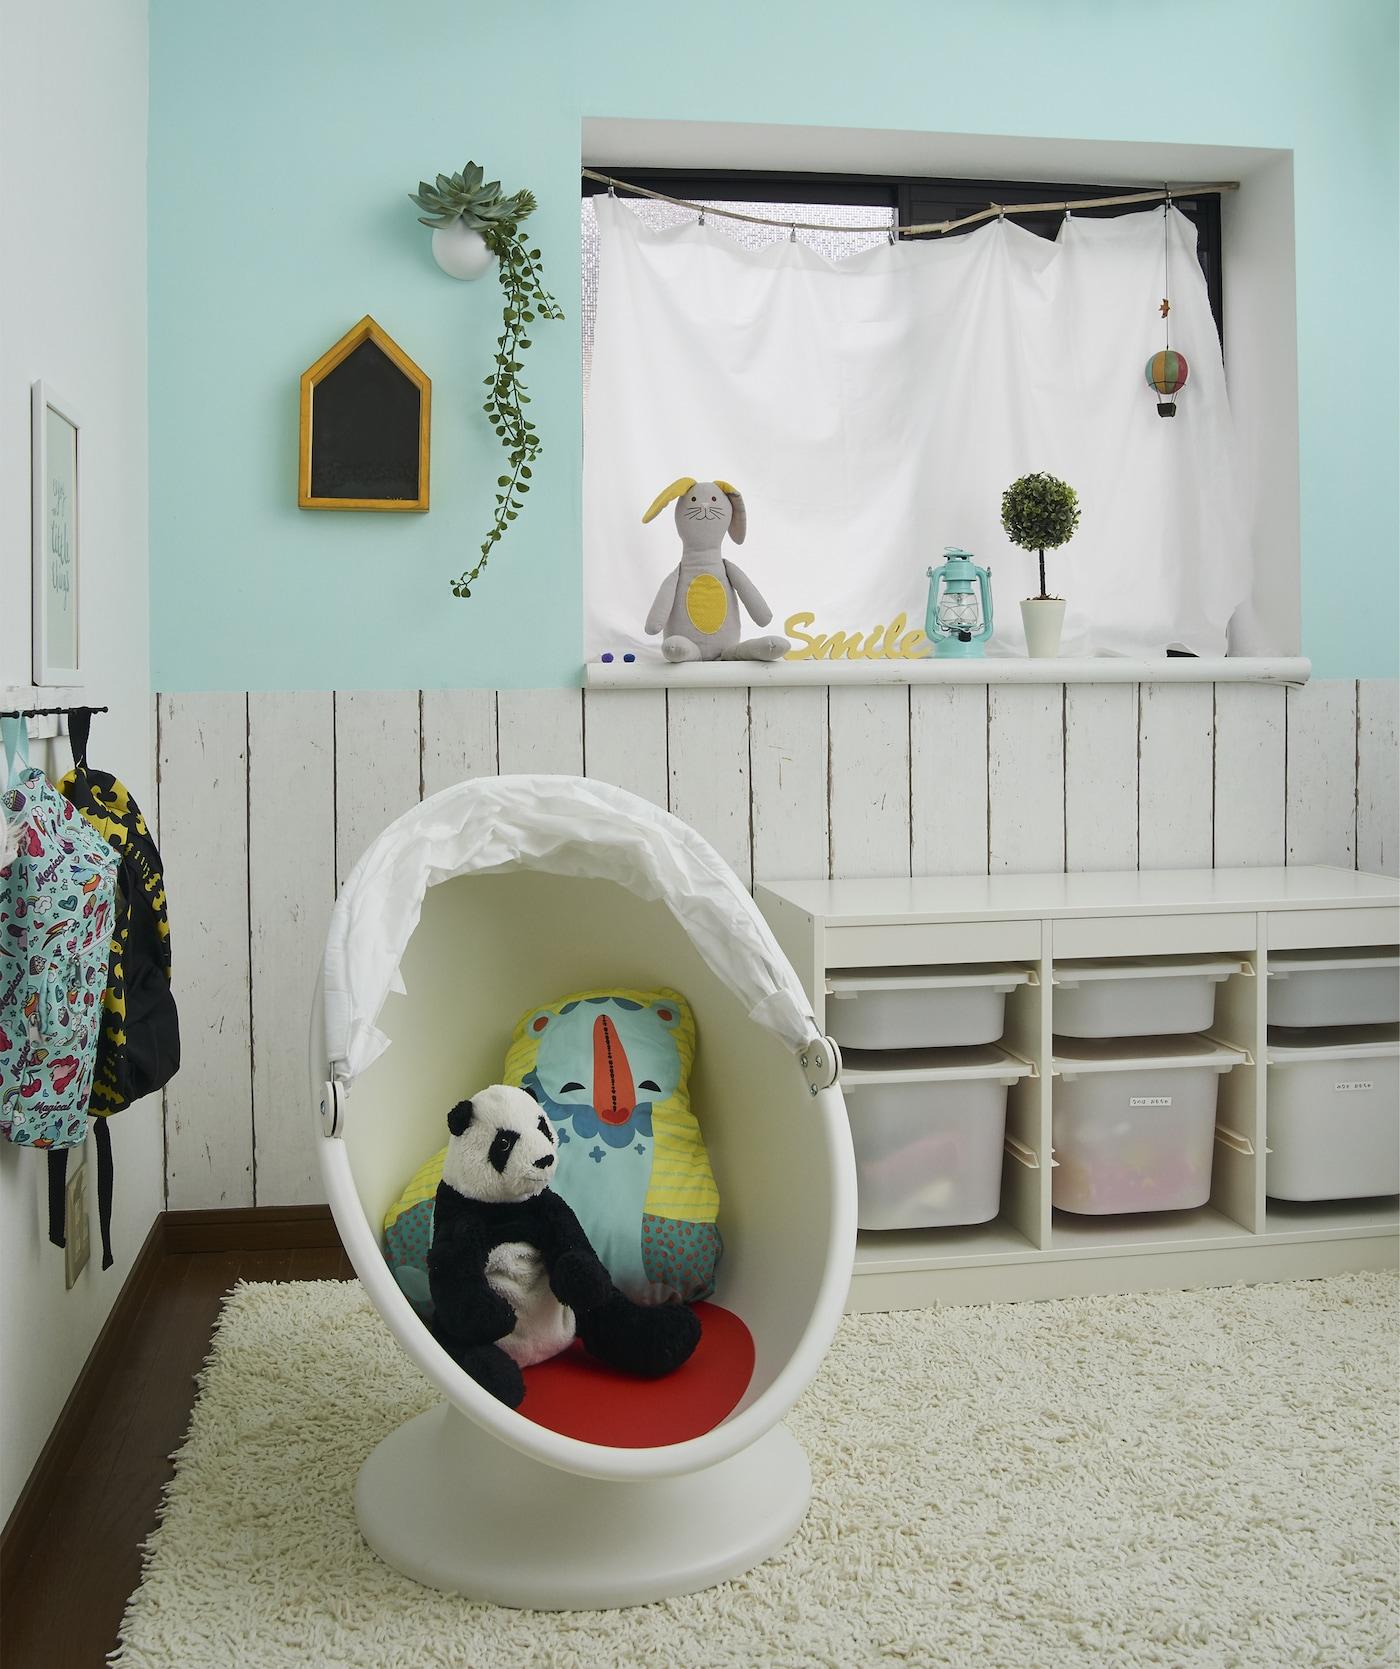 Omvisning i et kompakt familiehjem IKEA